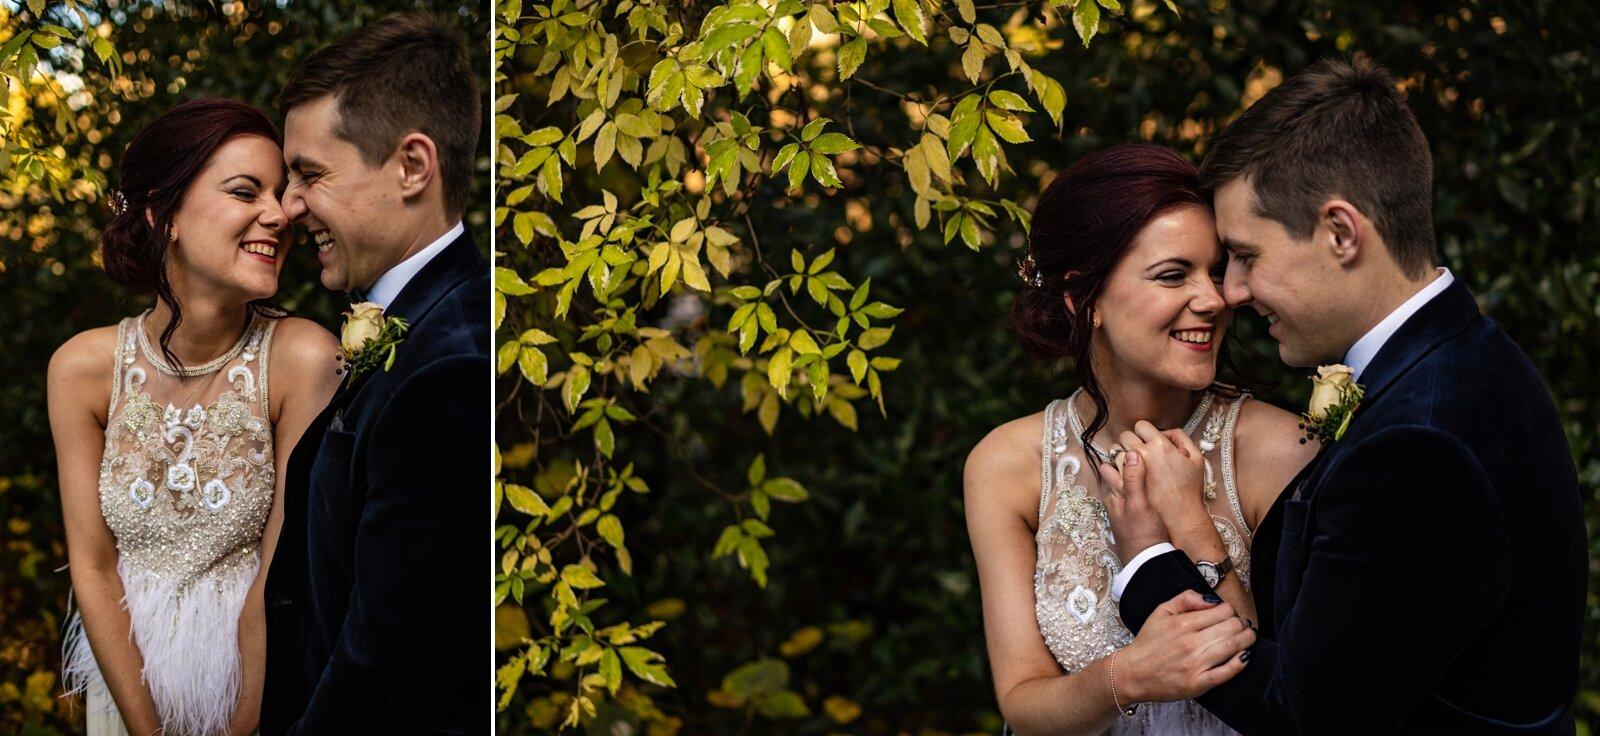 Andy&Szerdi-Photography_Couple_Elaine-Stephen-10.jpg